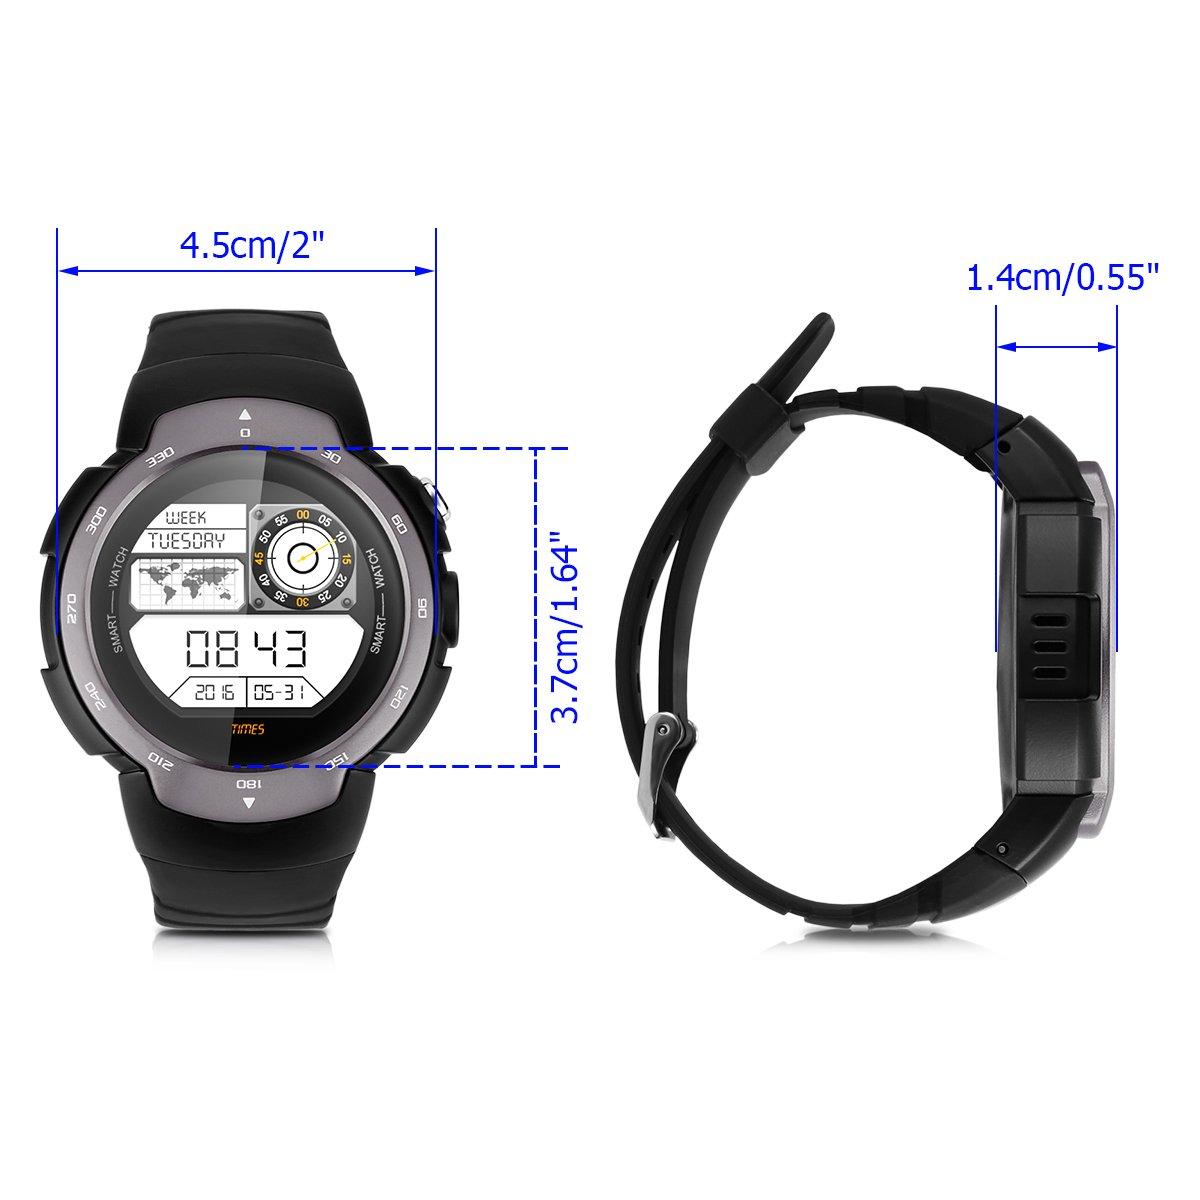 Zeblaze Blitz - 3G Impermeable Ajustable Smartwatch Smartphone Reloj Android 5.1 (Pantalla 1.33, MTK6580 Quad Core, SIM, Bluetooth 4.0, 4G Rom, WIFI GPS, ...